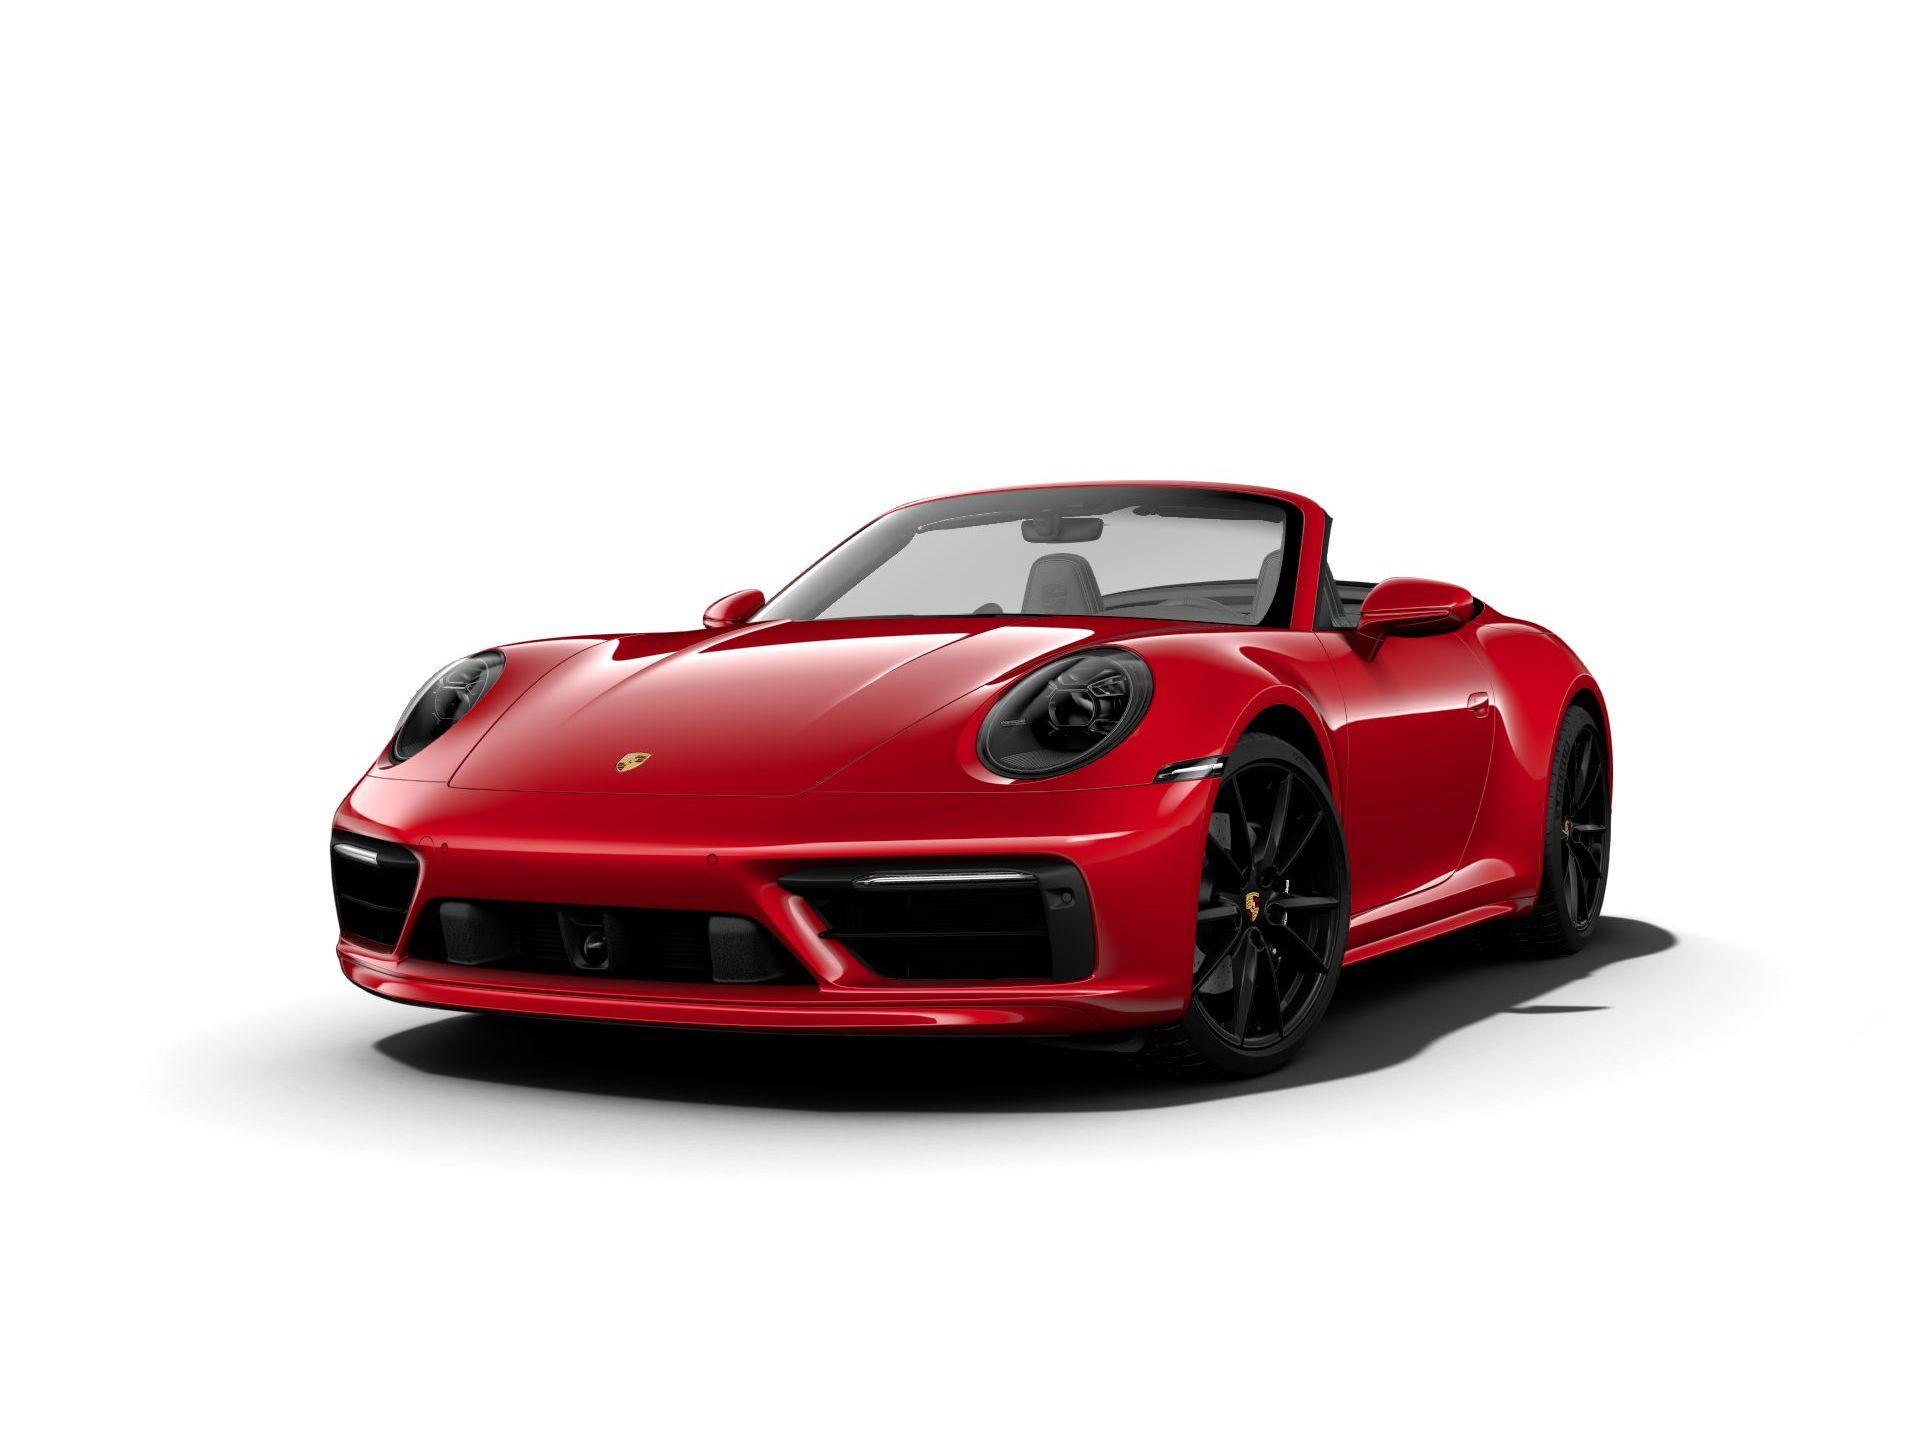 2021 Porsche 911 Carrera 4S Cabriolet – 1